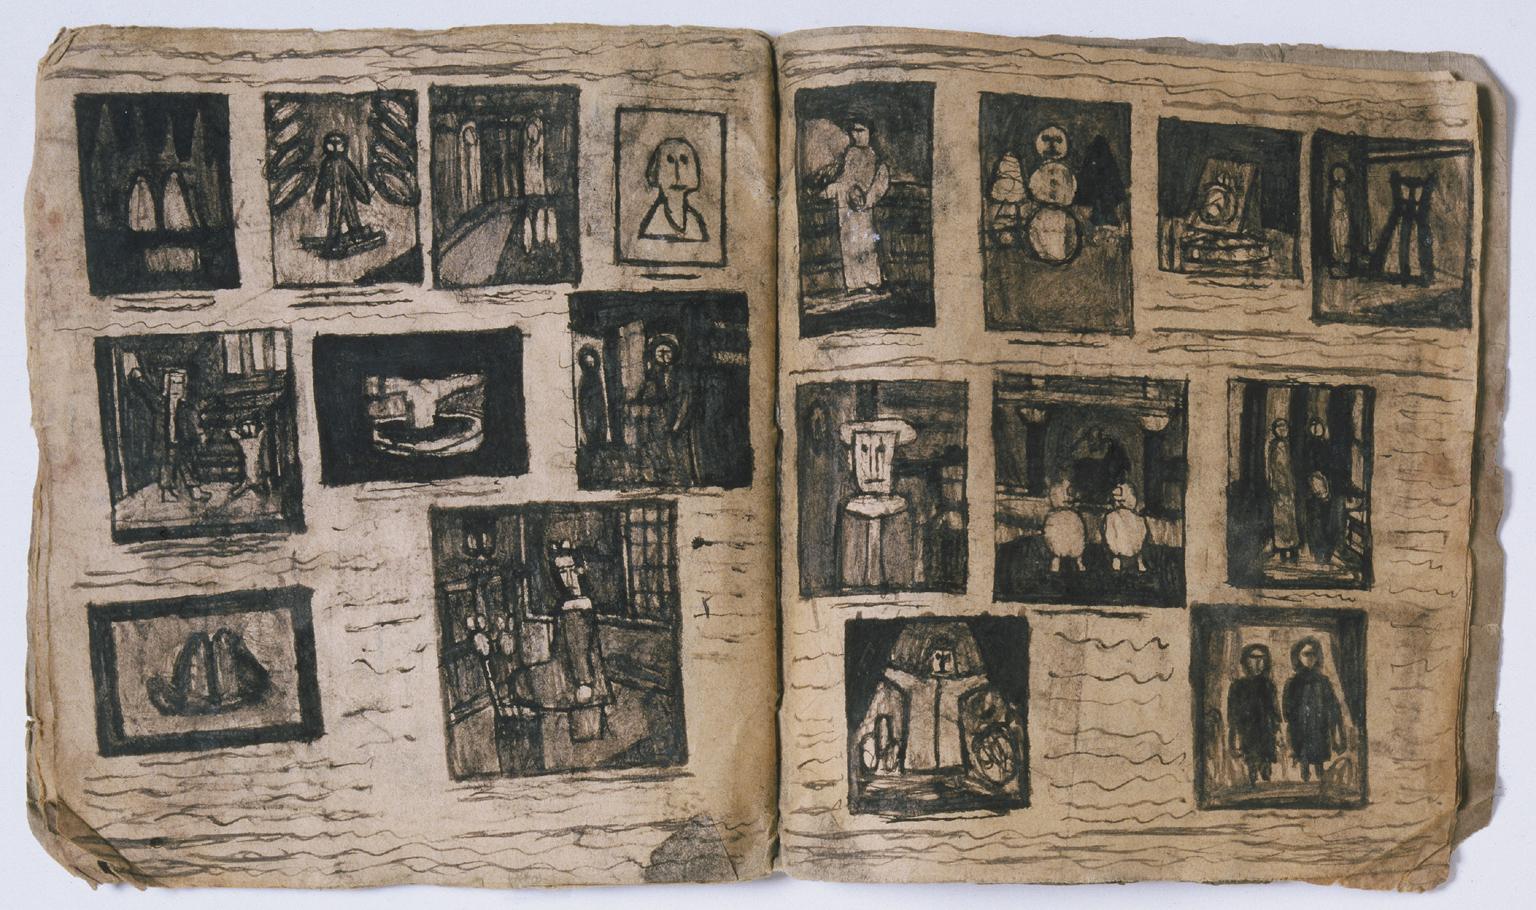 0JamesCastle-Drawing-Book-PhotoAlbum.jpg